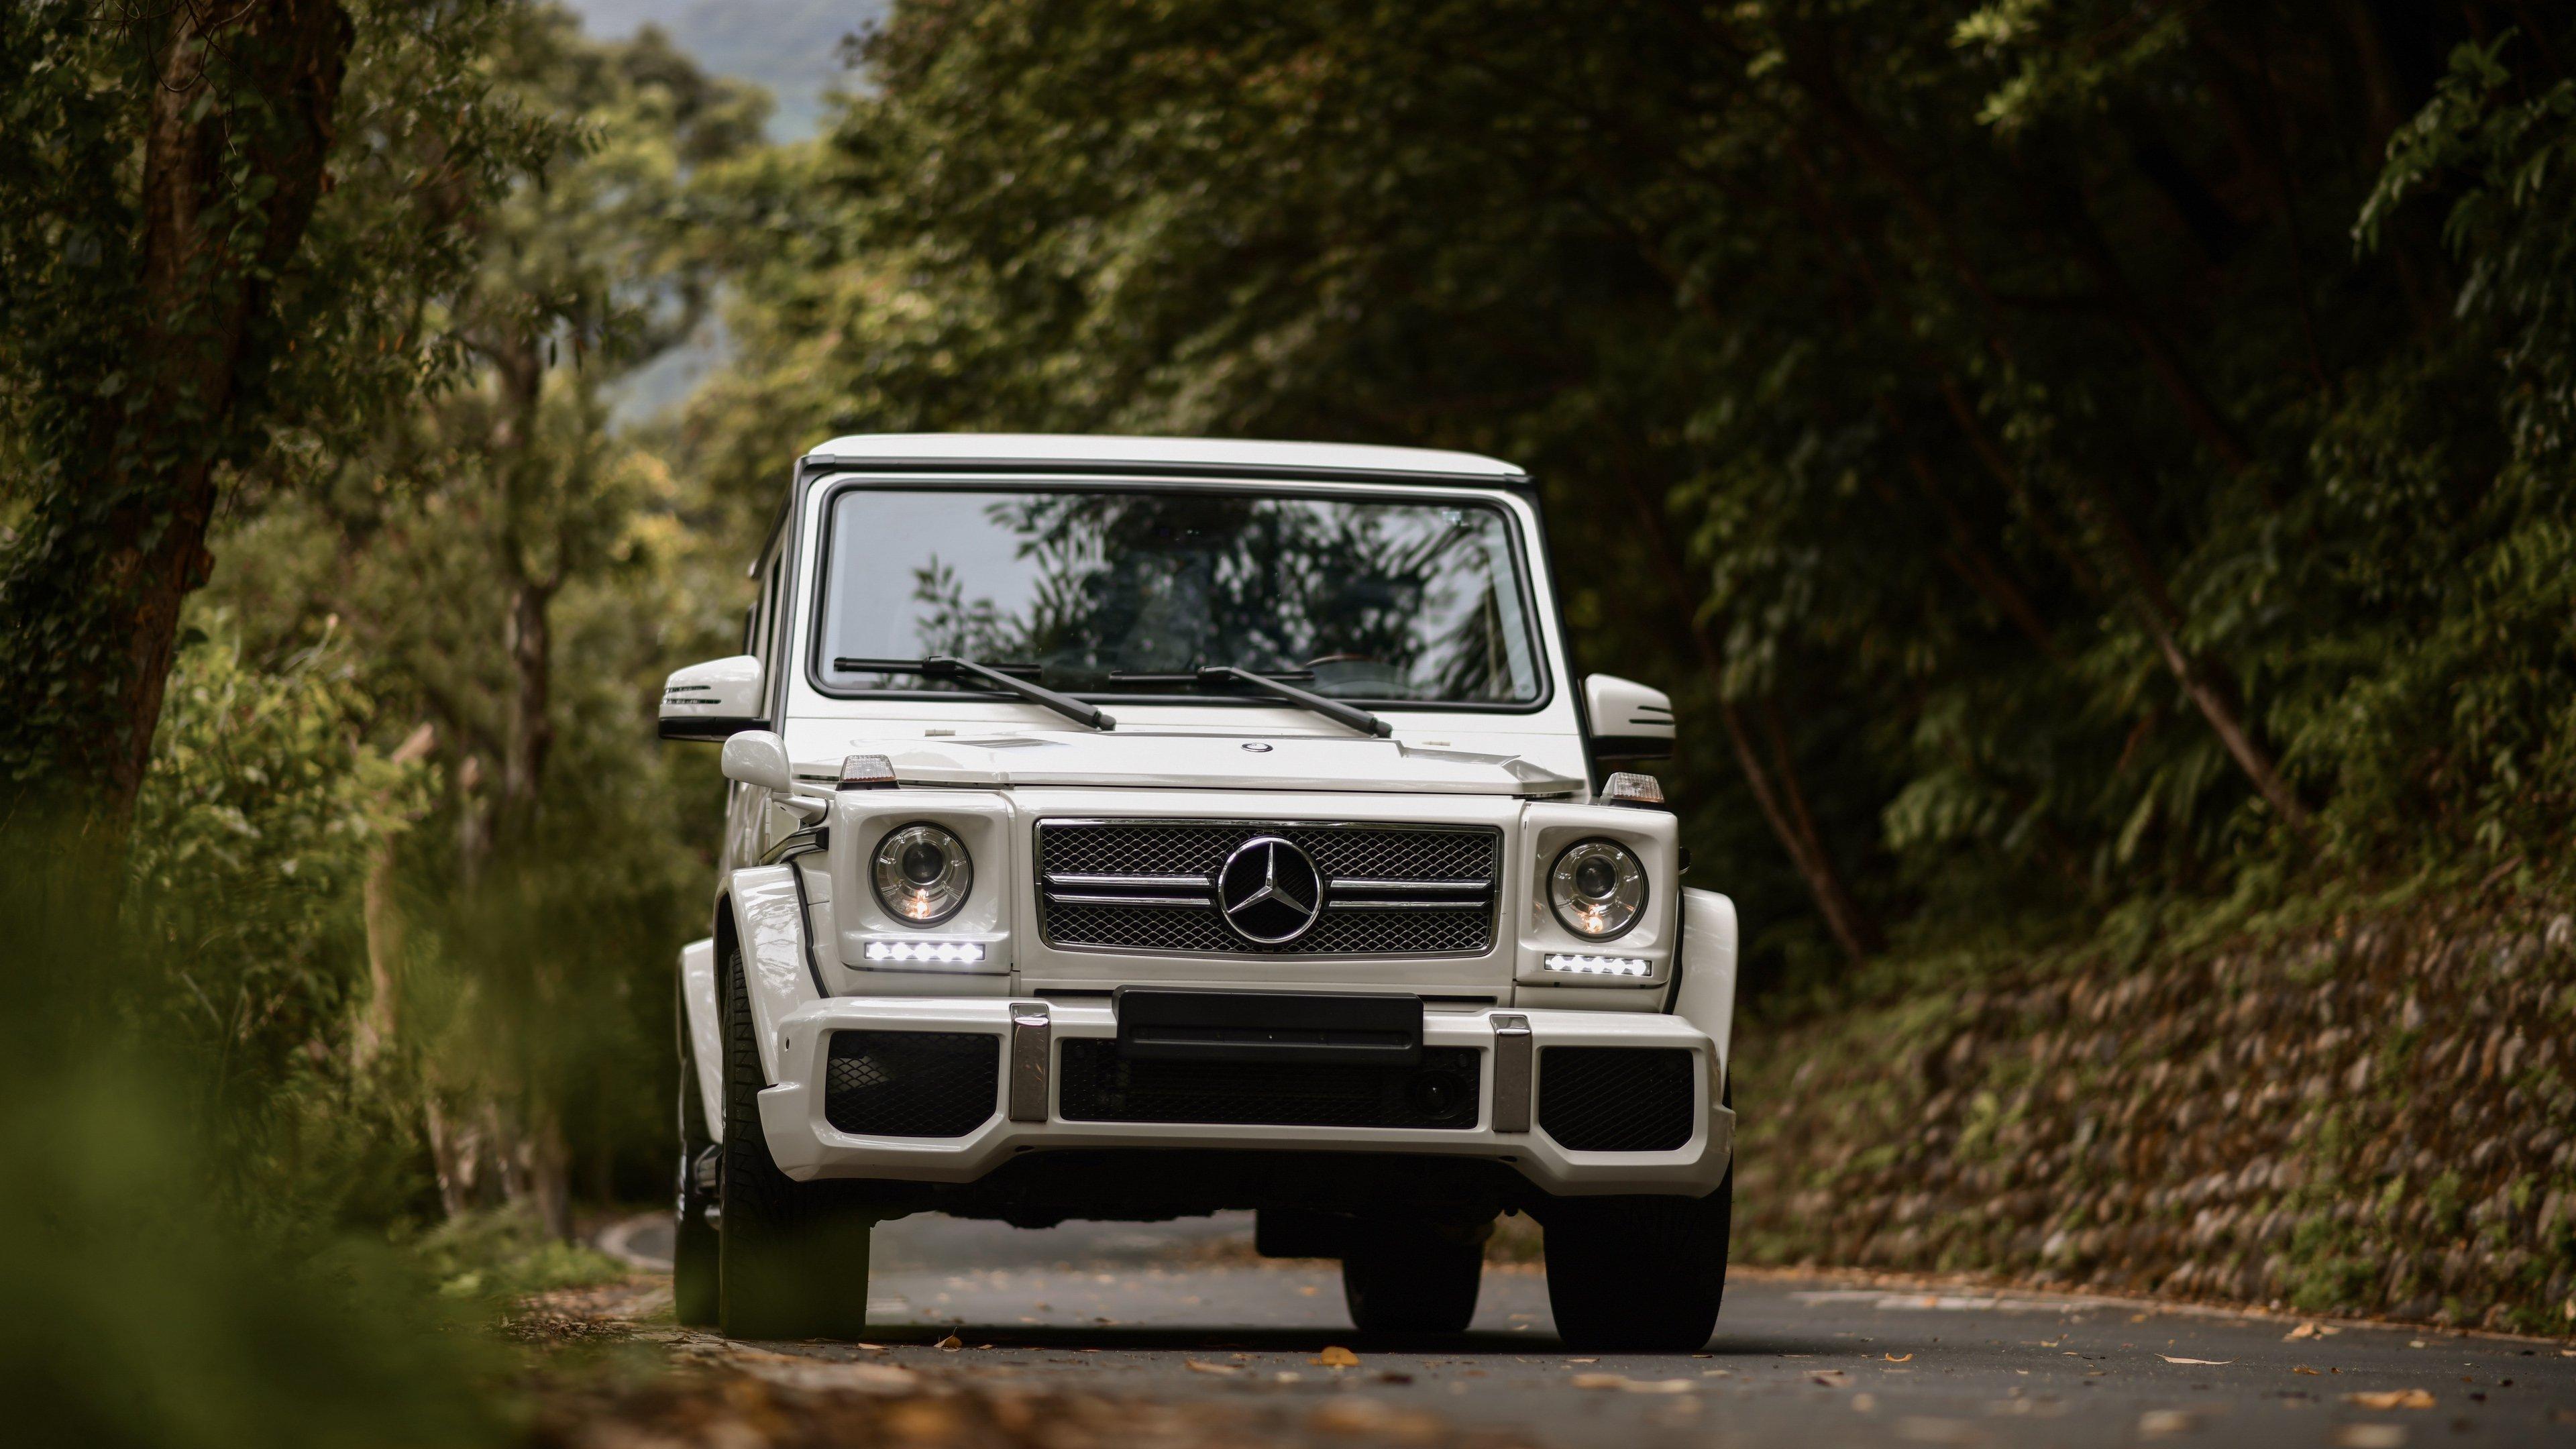 Мерседес, Mercedes-Benz g-class, обои автомобиль мерс